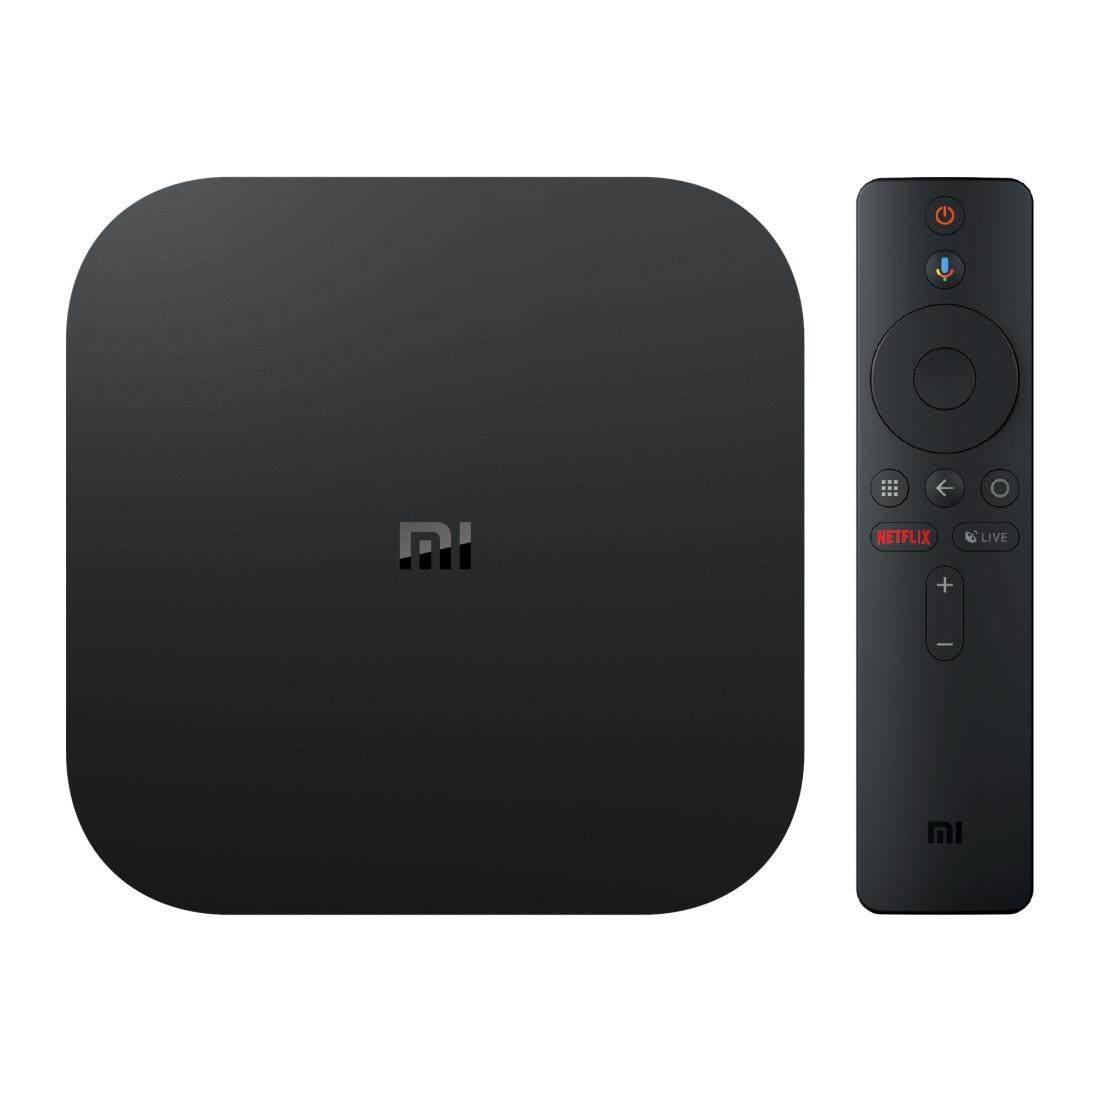 Xiaomi Mi Box S Smart TV Media Player 4K HDR Android 8.1 2GB 8GB Global Version